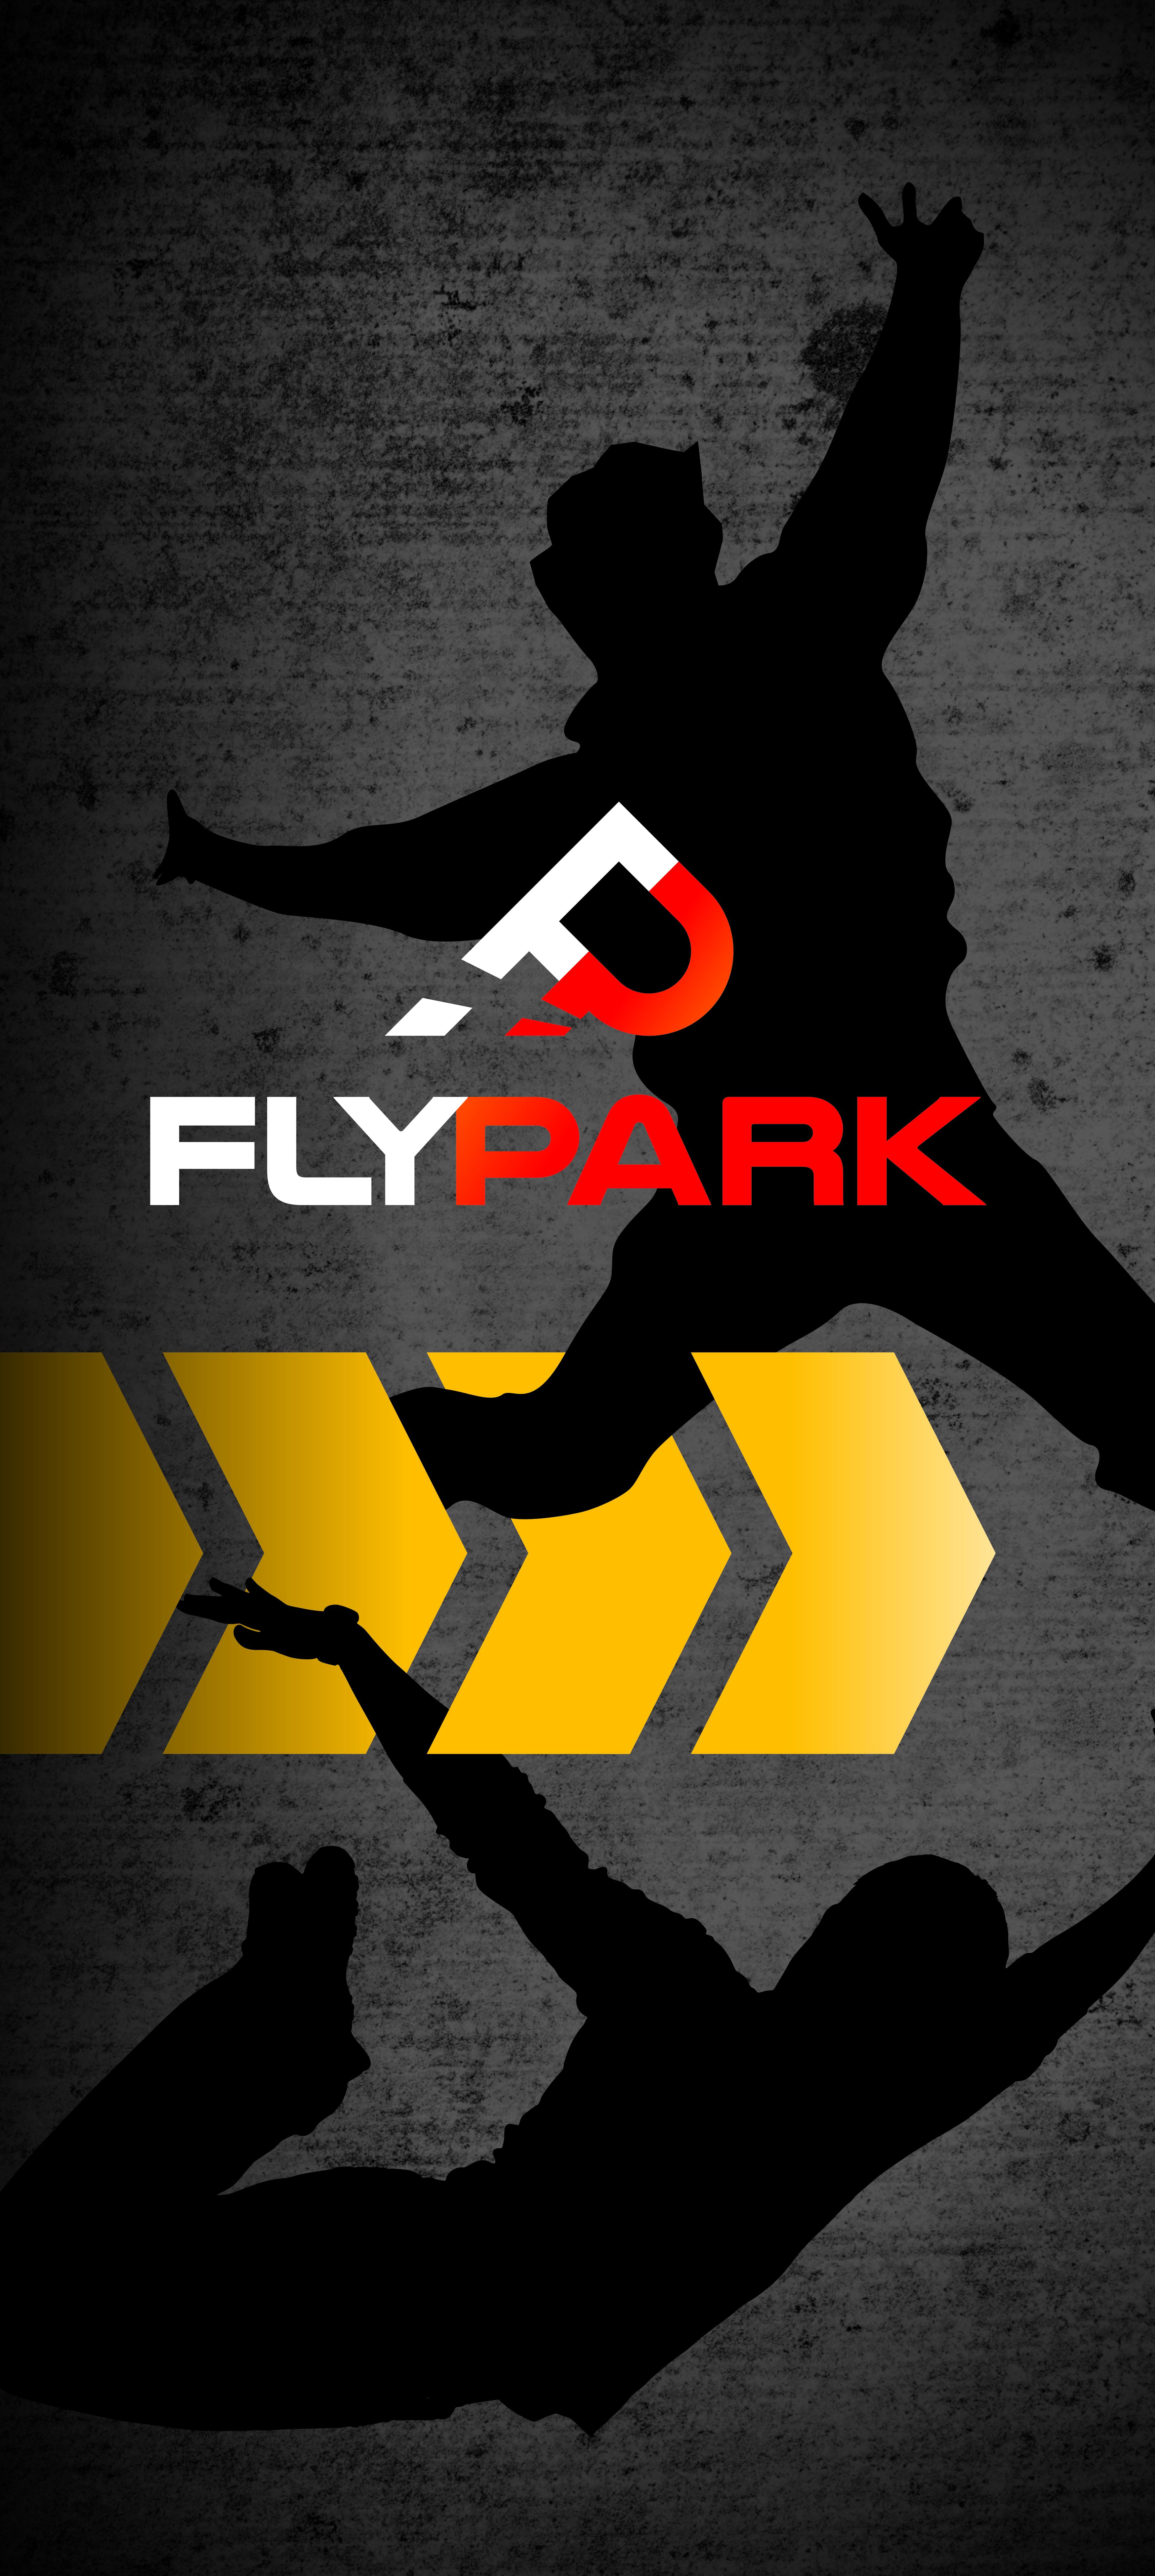 flypark-koszalin-baner-130x290cm-111